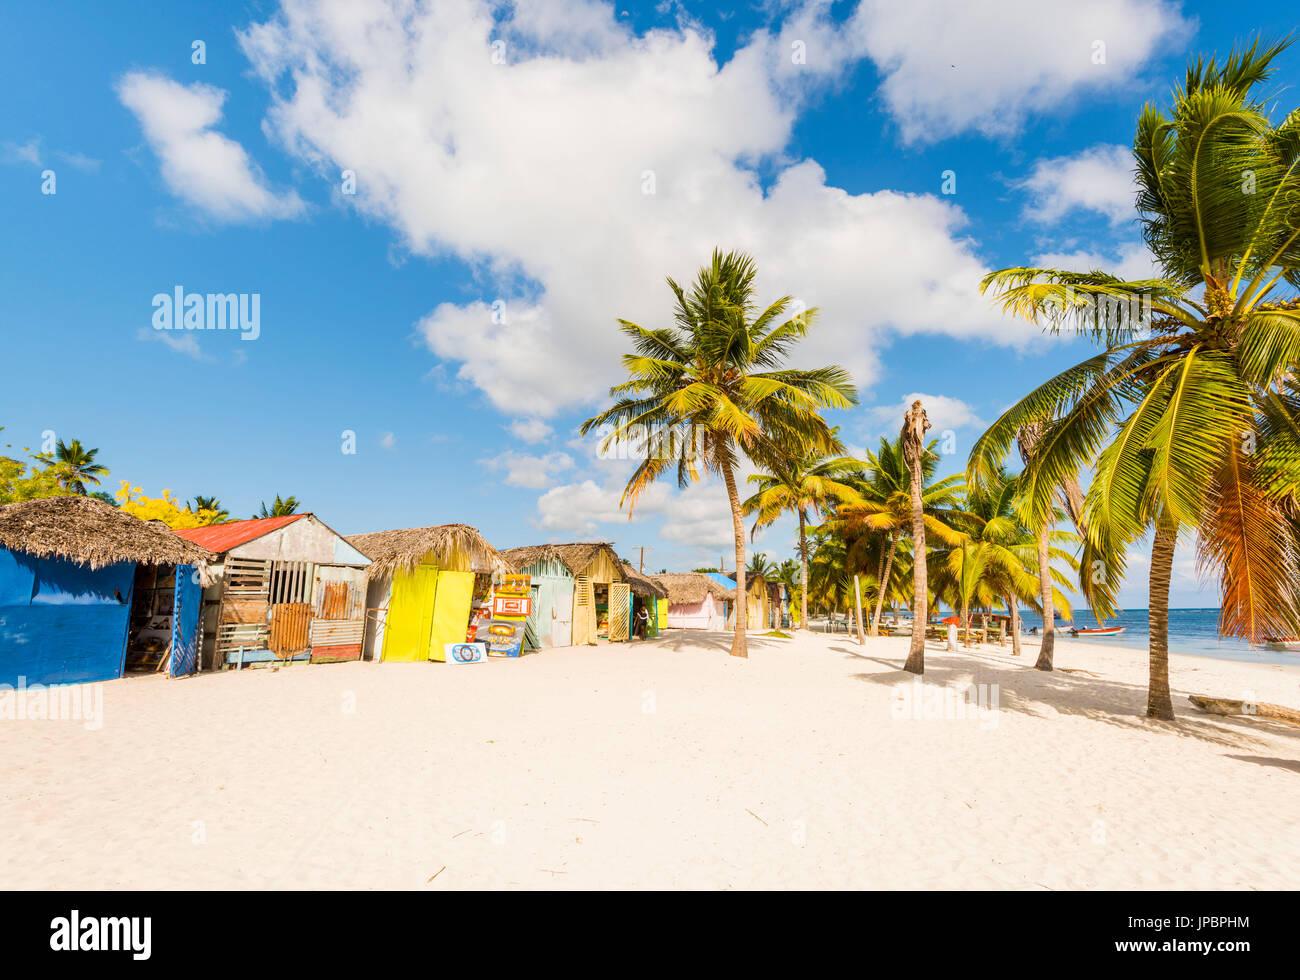 Mano Juan, Saona, East National Park (Parque Nacional del Este), Dominikanische Republik, Karibik. Stockbild